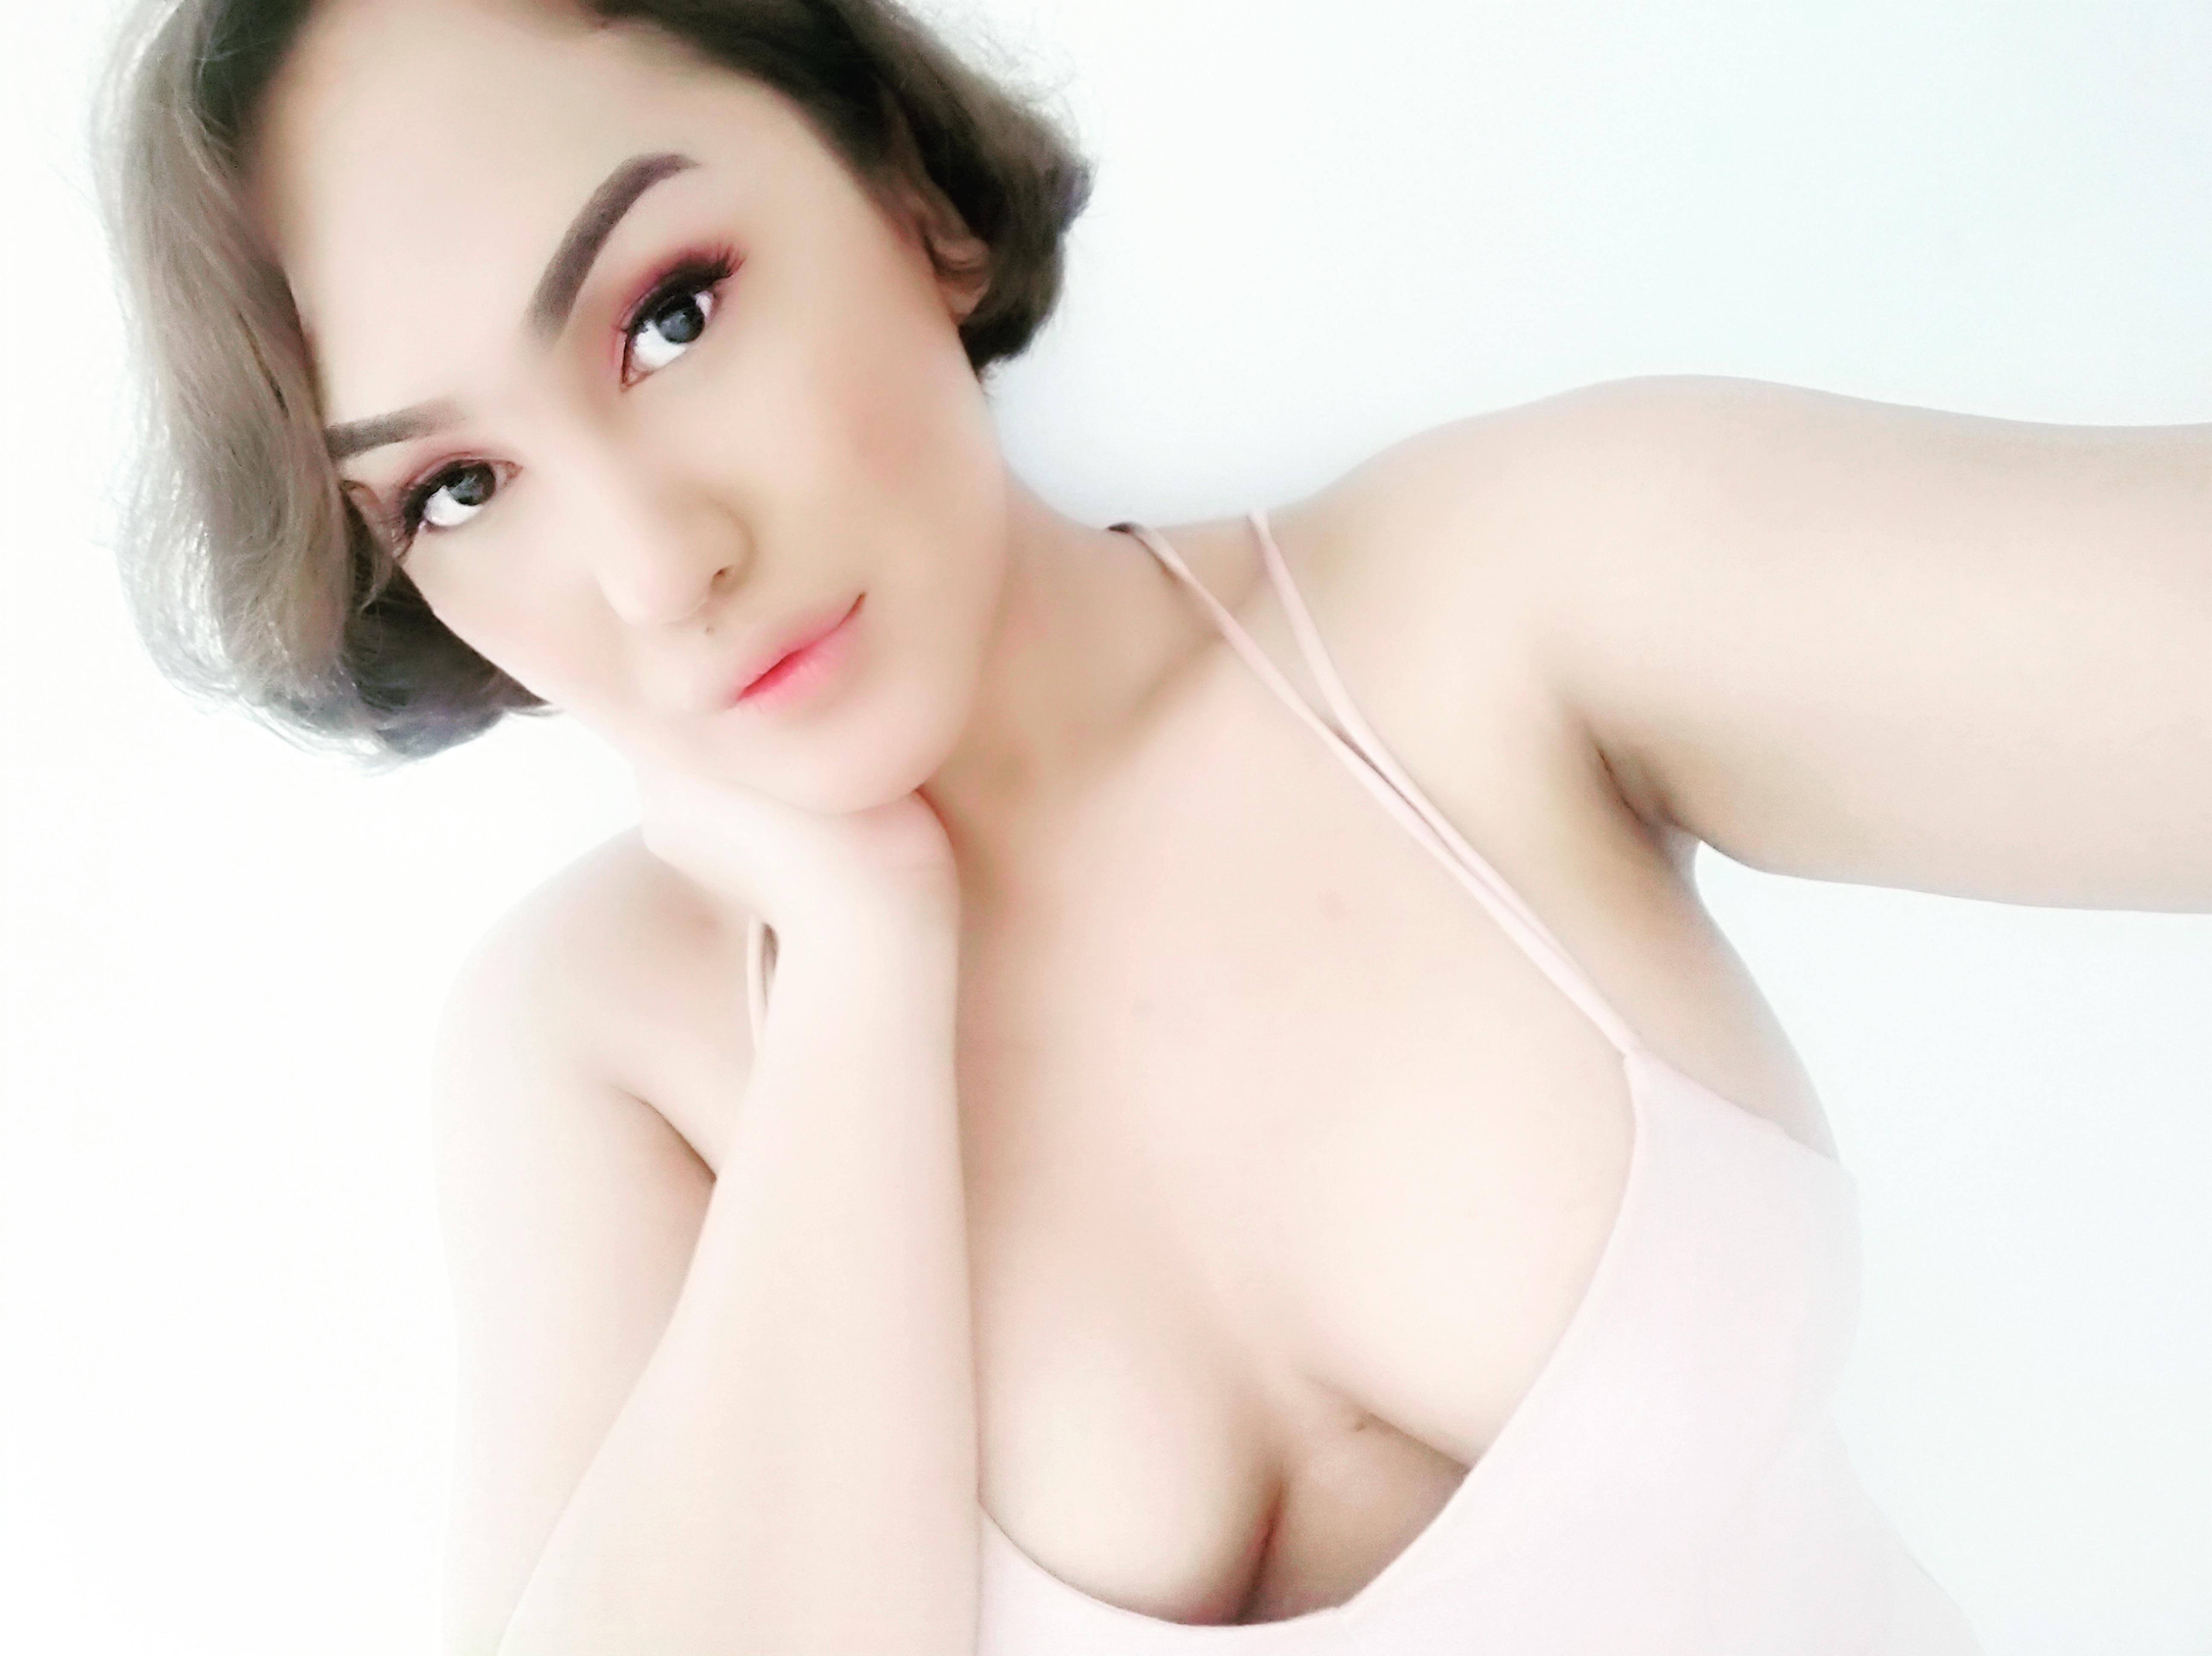 realescort homoseksuell norge thai massasje haugesund